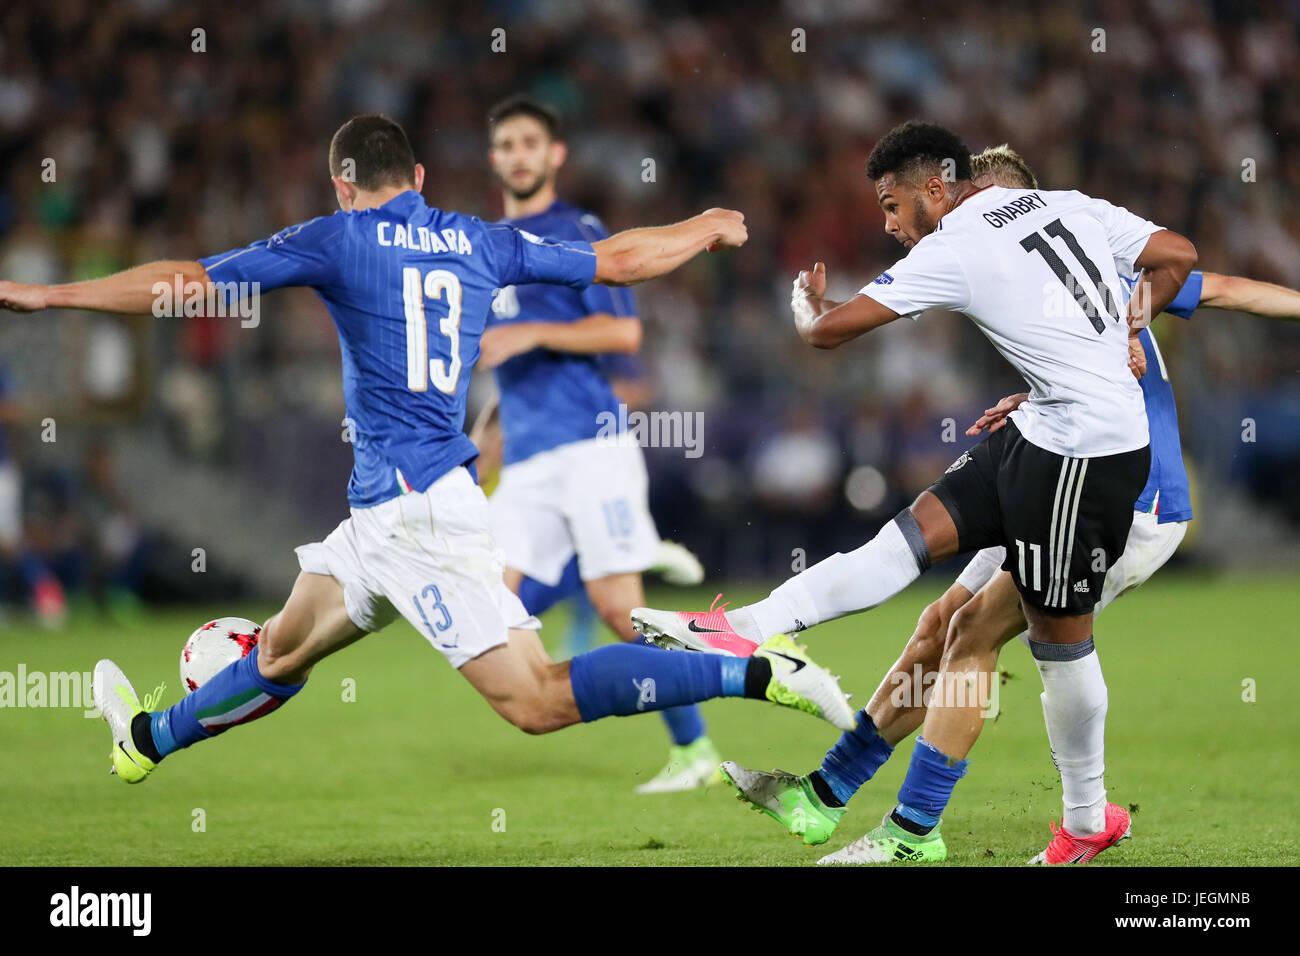 Cracow, Poland. 24th June, 2017. Italian Mattia Caldara (L) foils an attempt on the Italian goal by German player - Stock Image